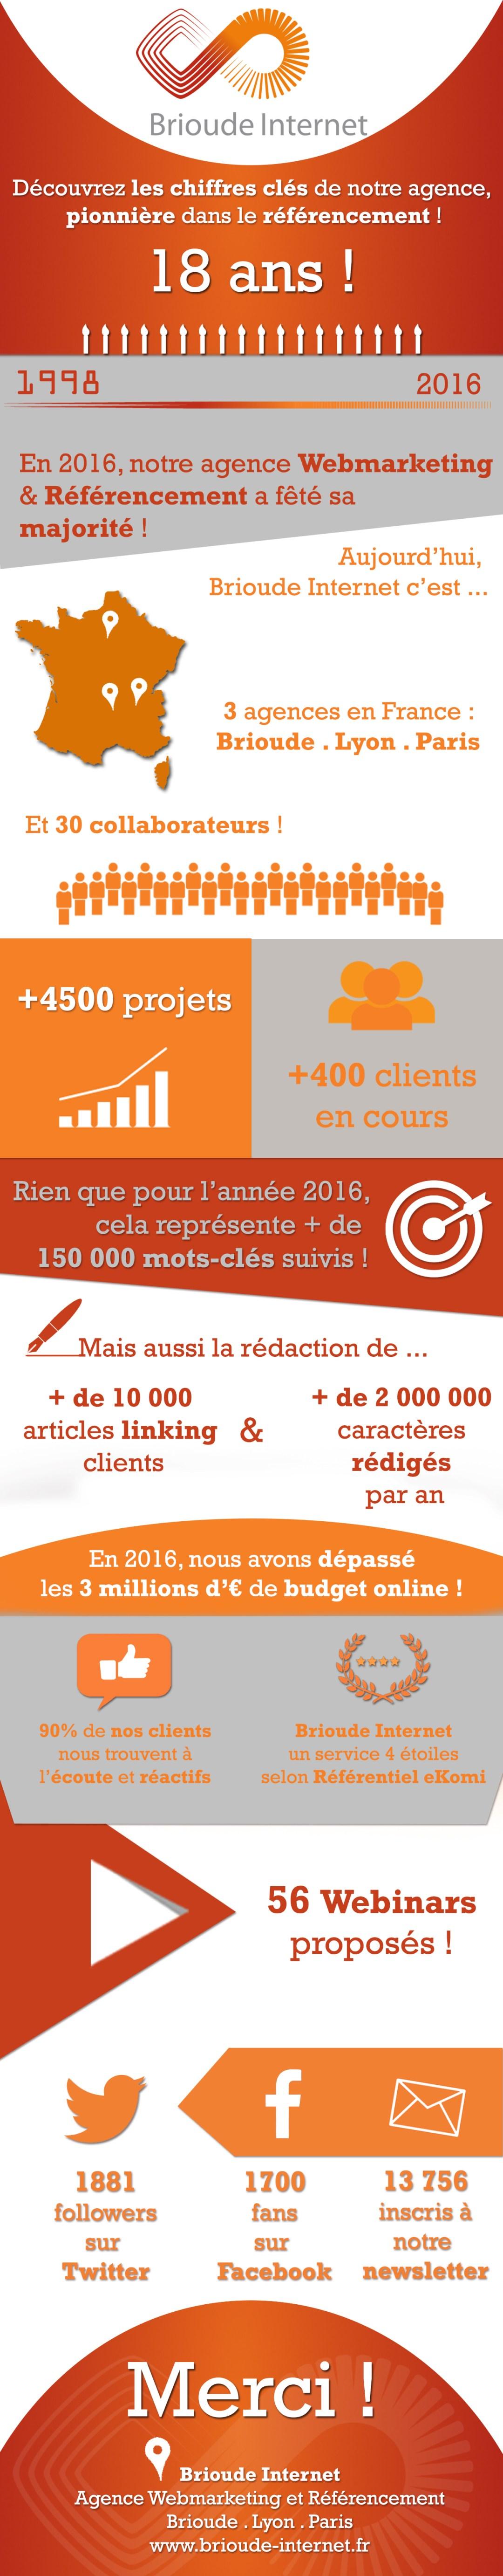 infographie-brioude-internet-chiffre-cles-2016-final